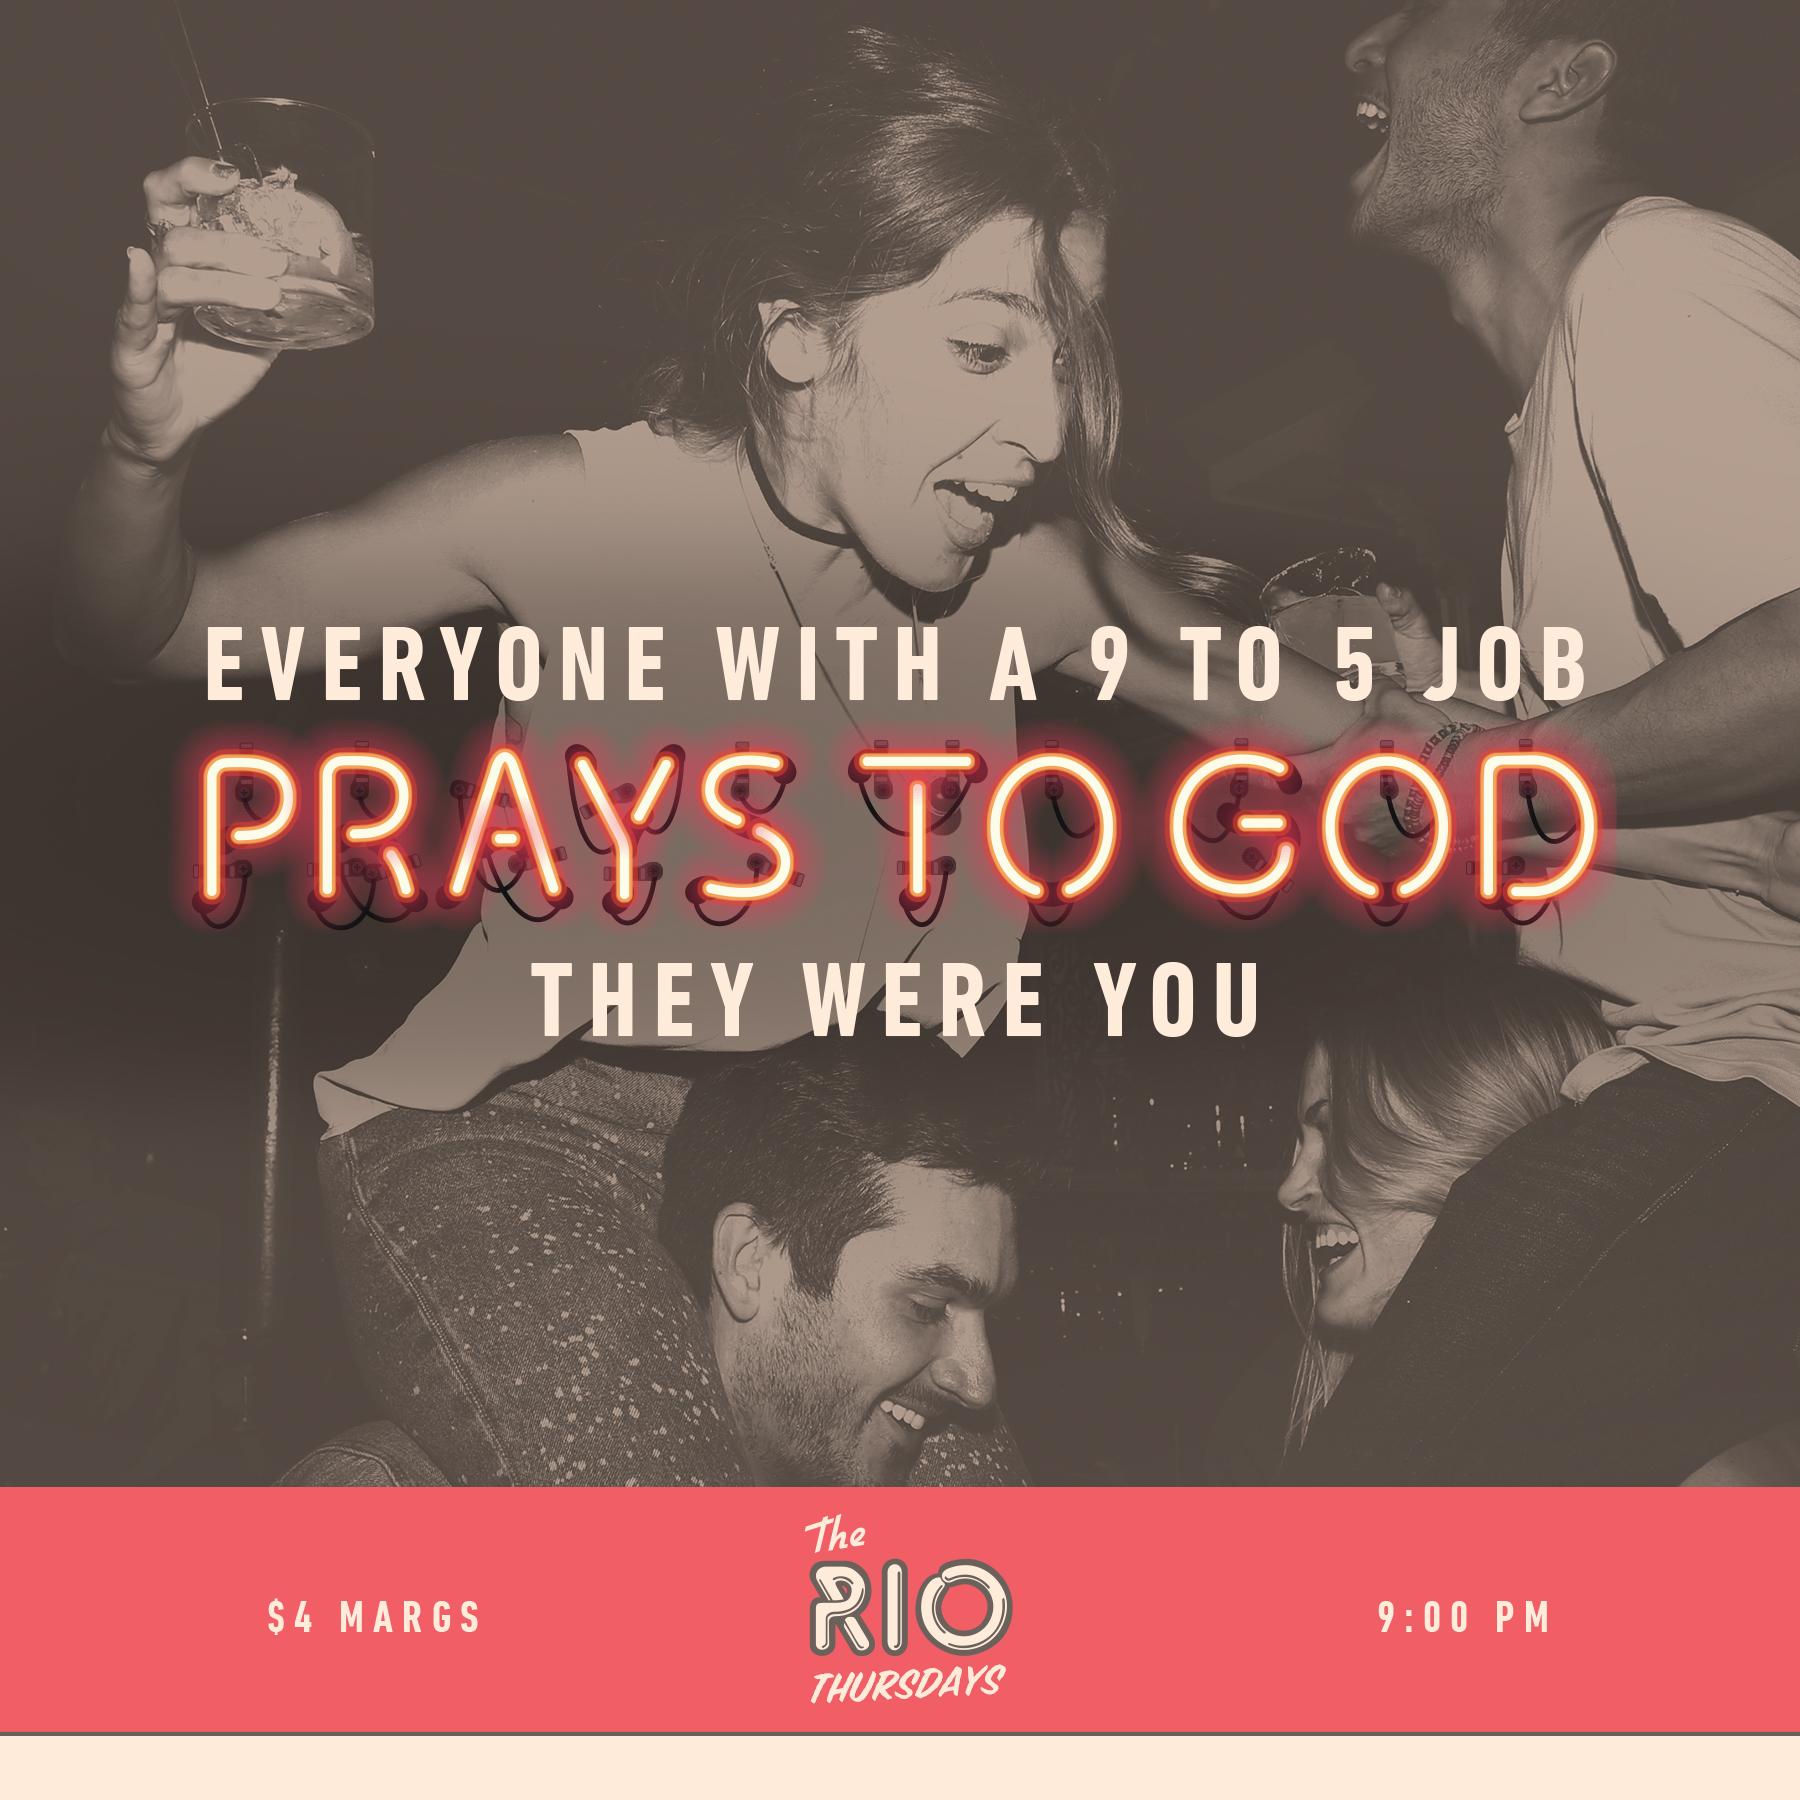 Post_Prays.jpg